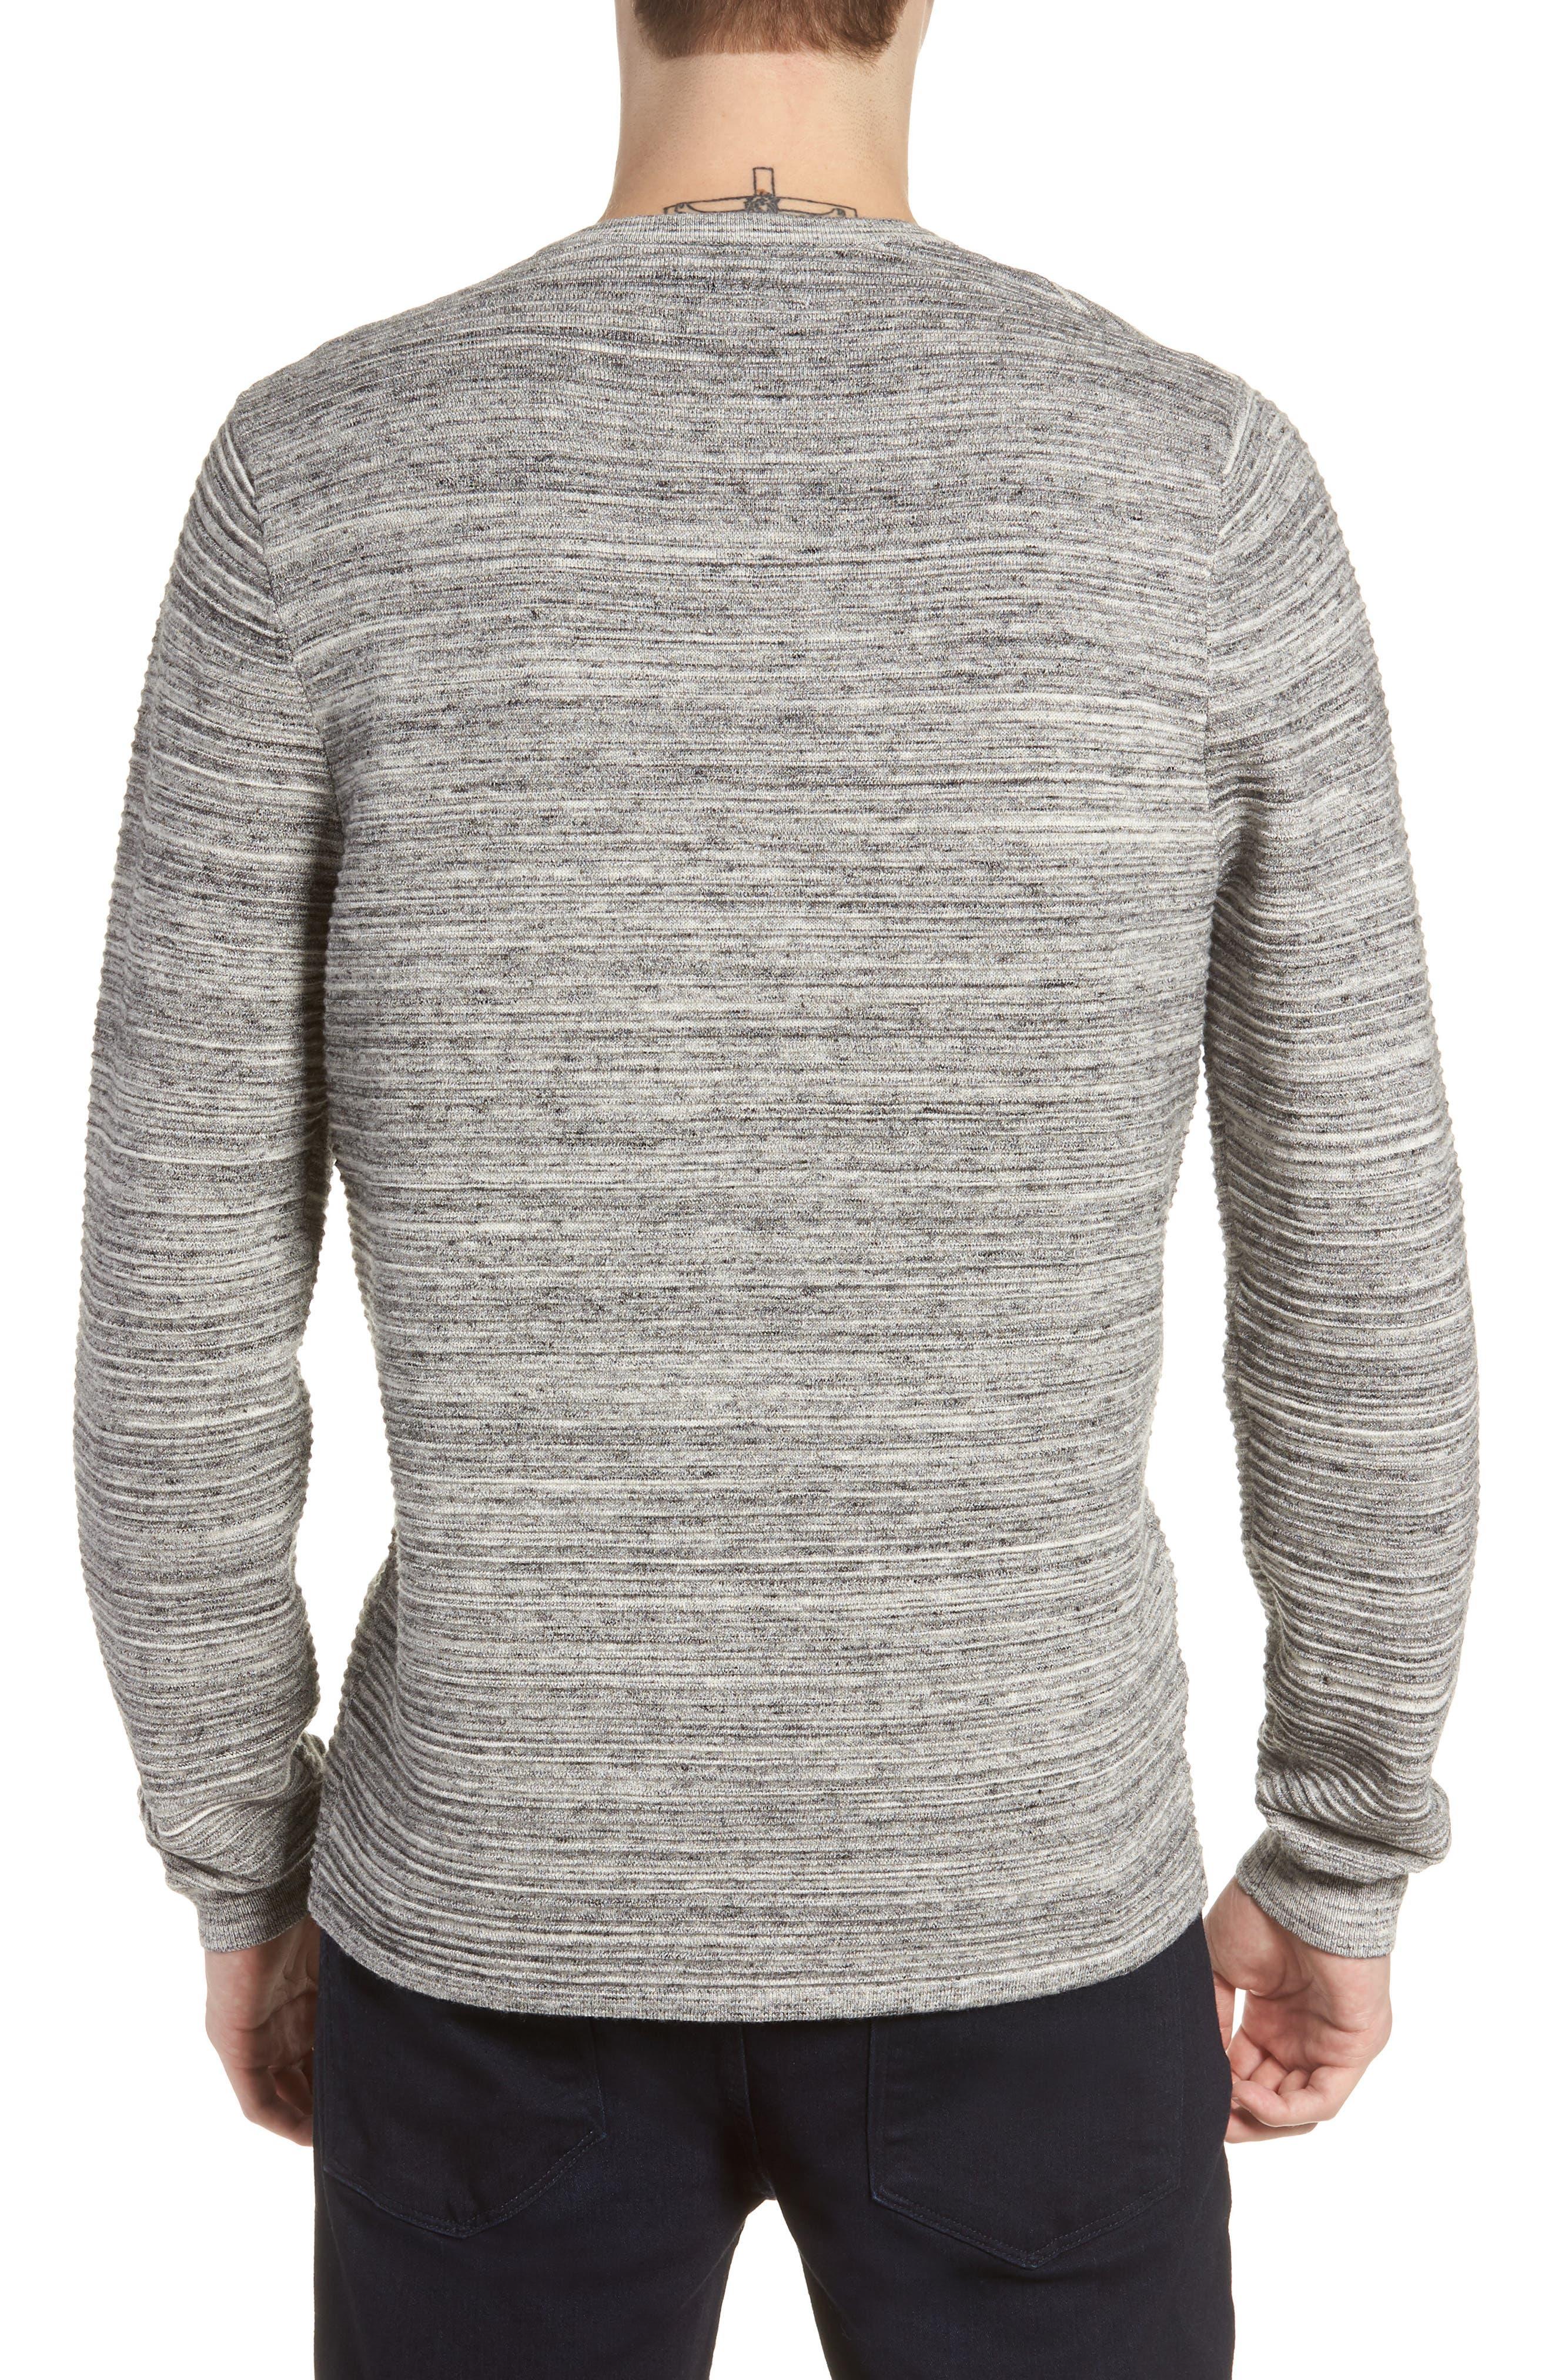 Ottoman Crewneck Sweater,                             Alternate thumbnail 2, color,                             GREY TORNADO SPACEDYE